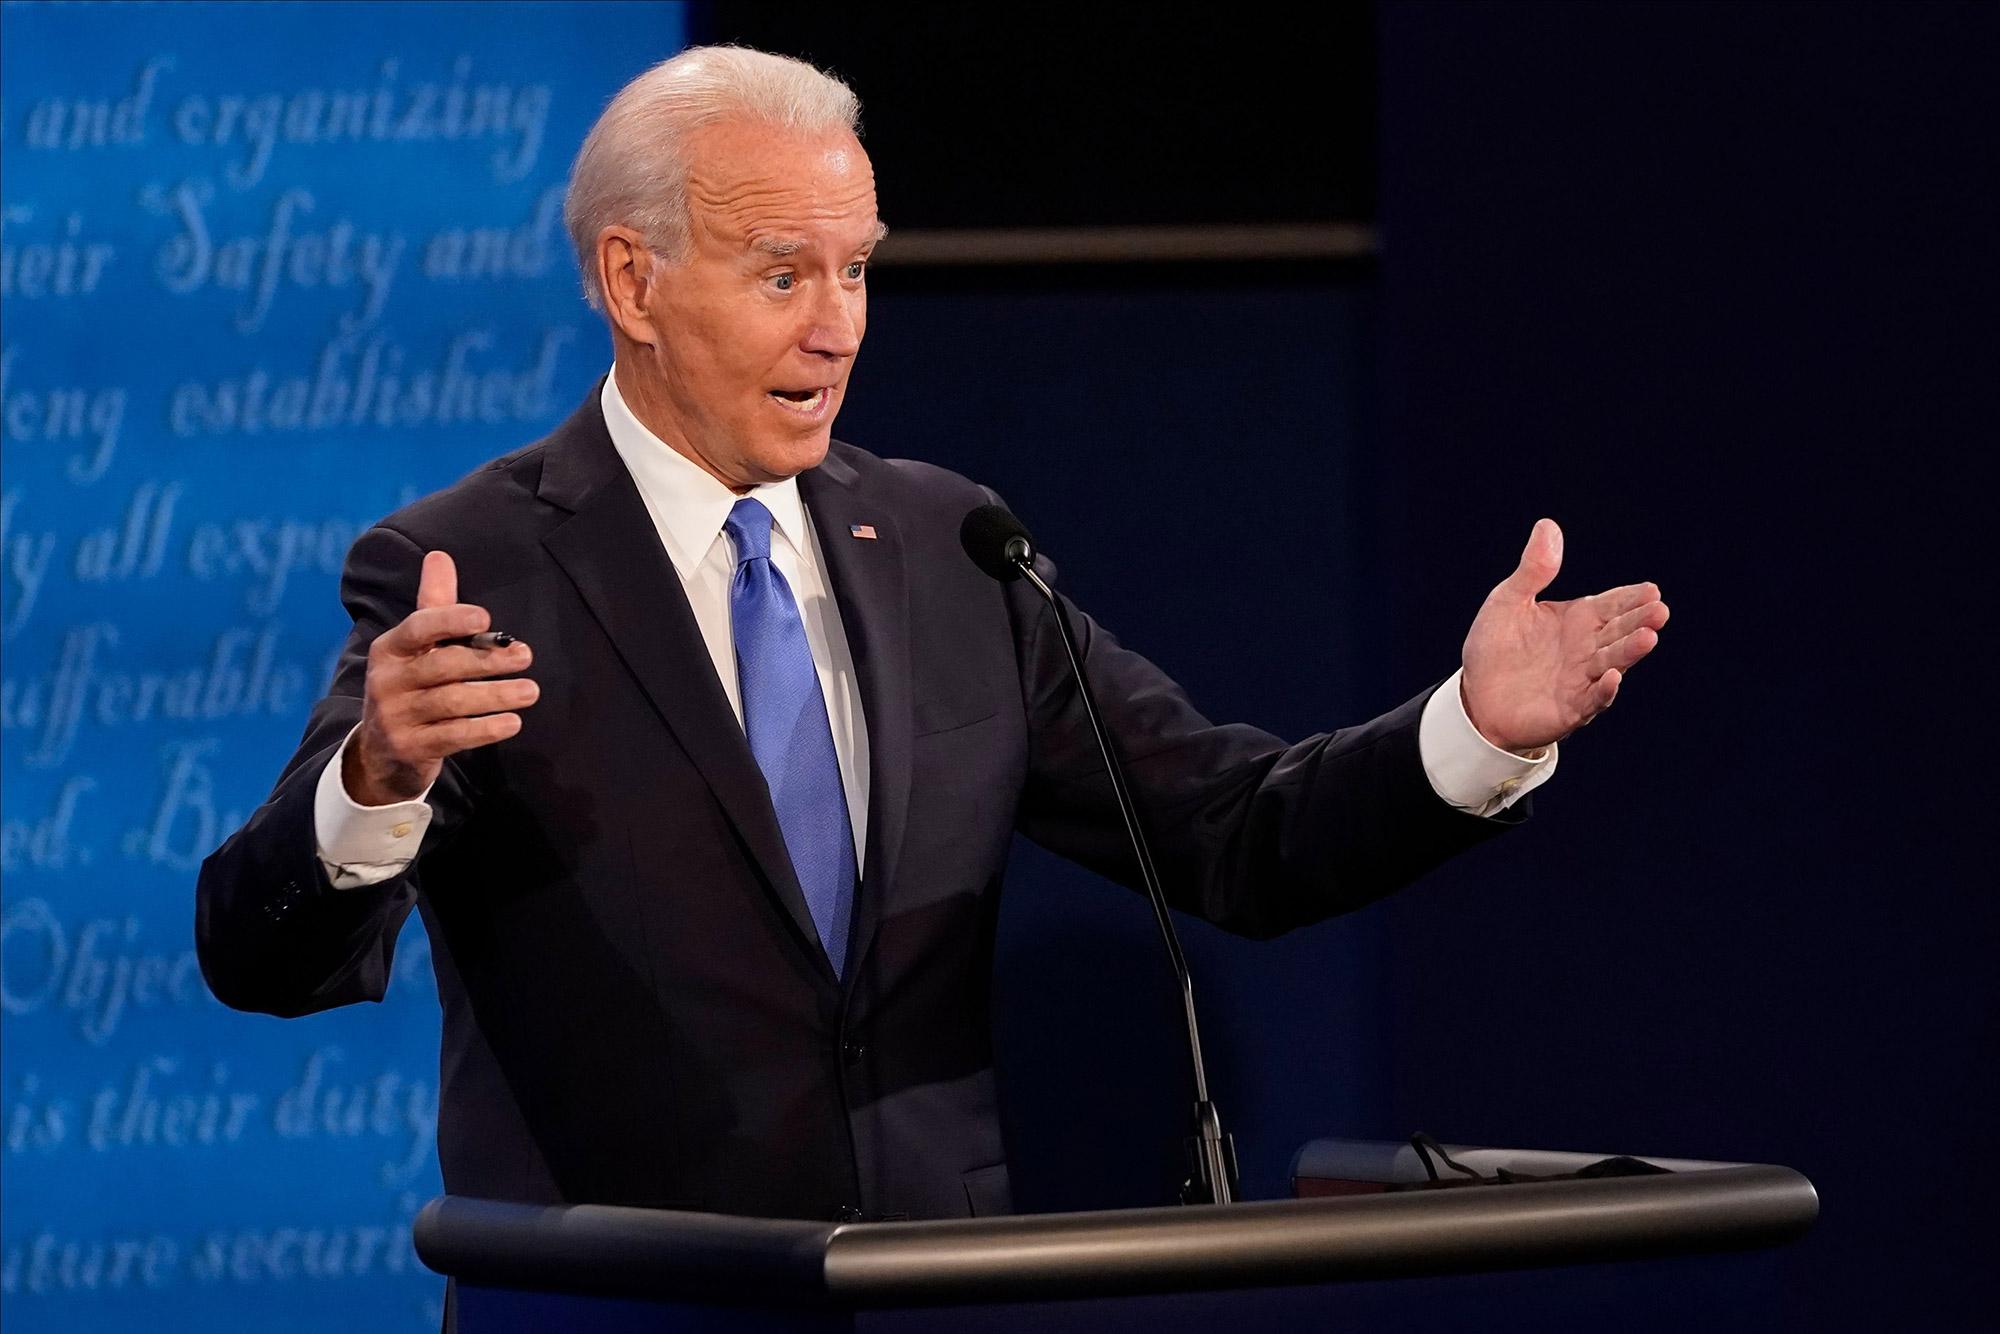 Biden says coronavirus vaccine must be 'freely available to everyone'